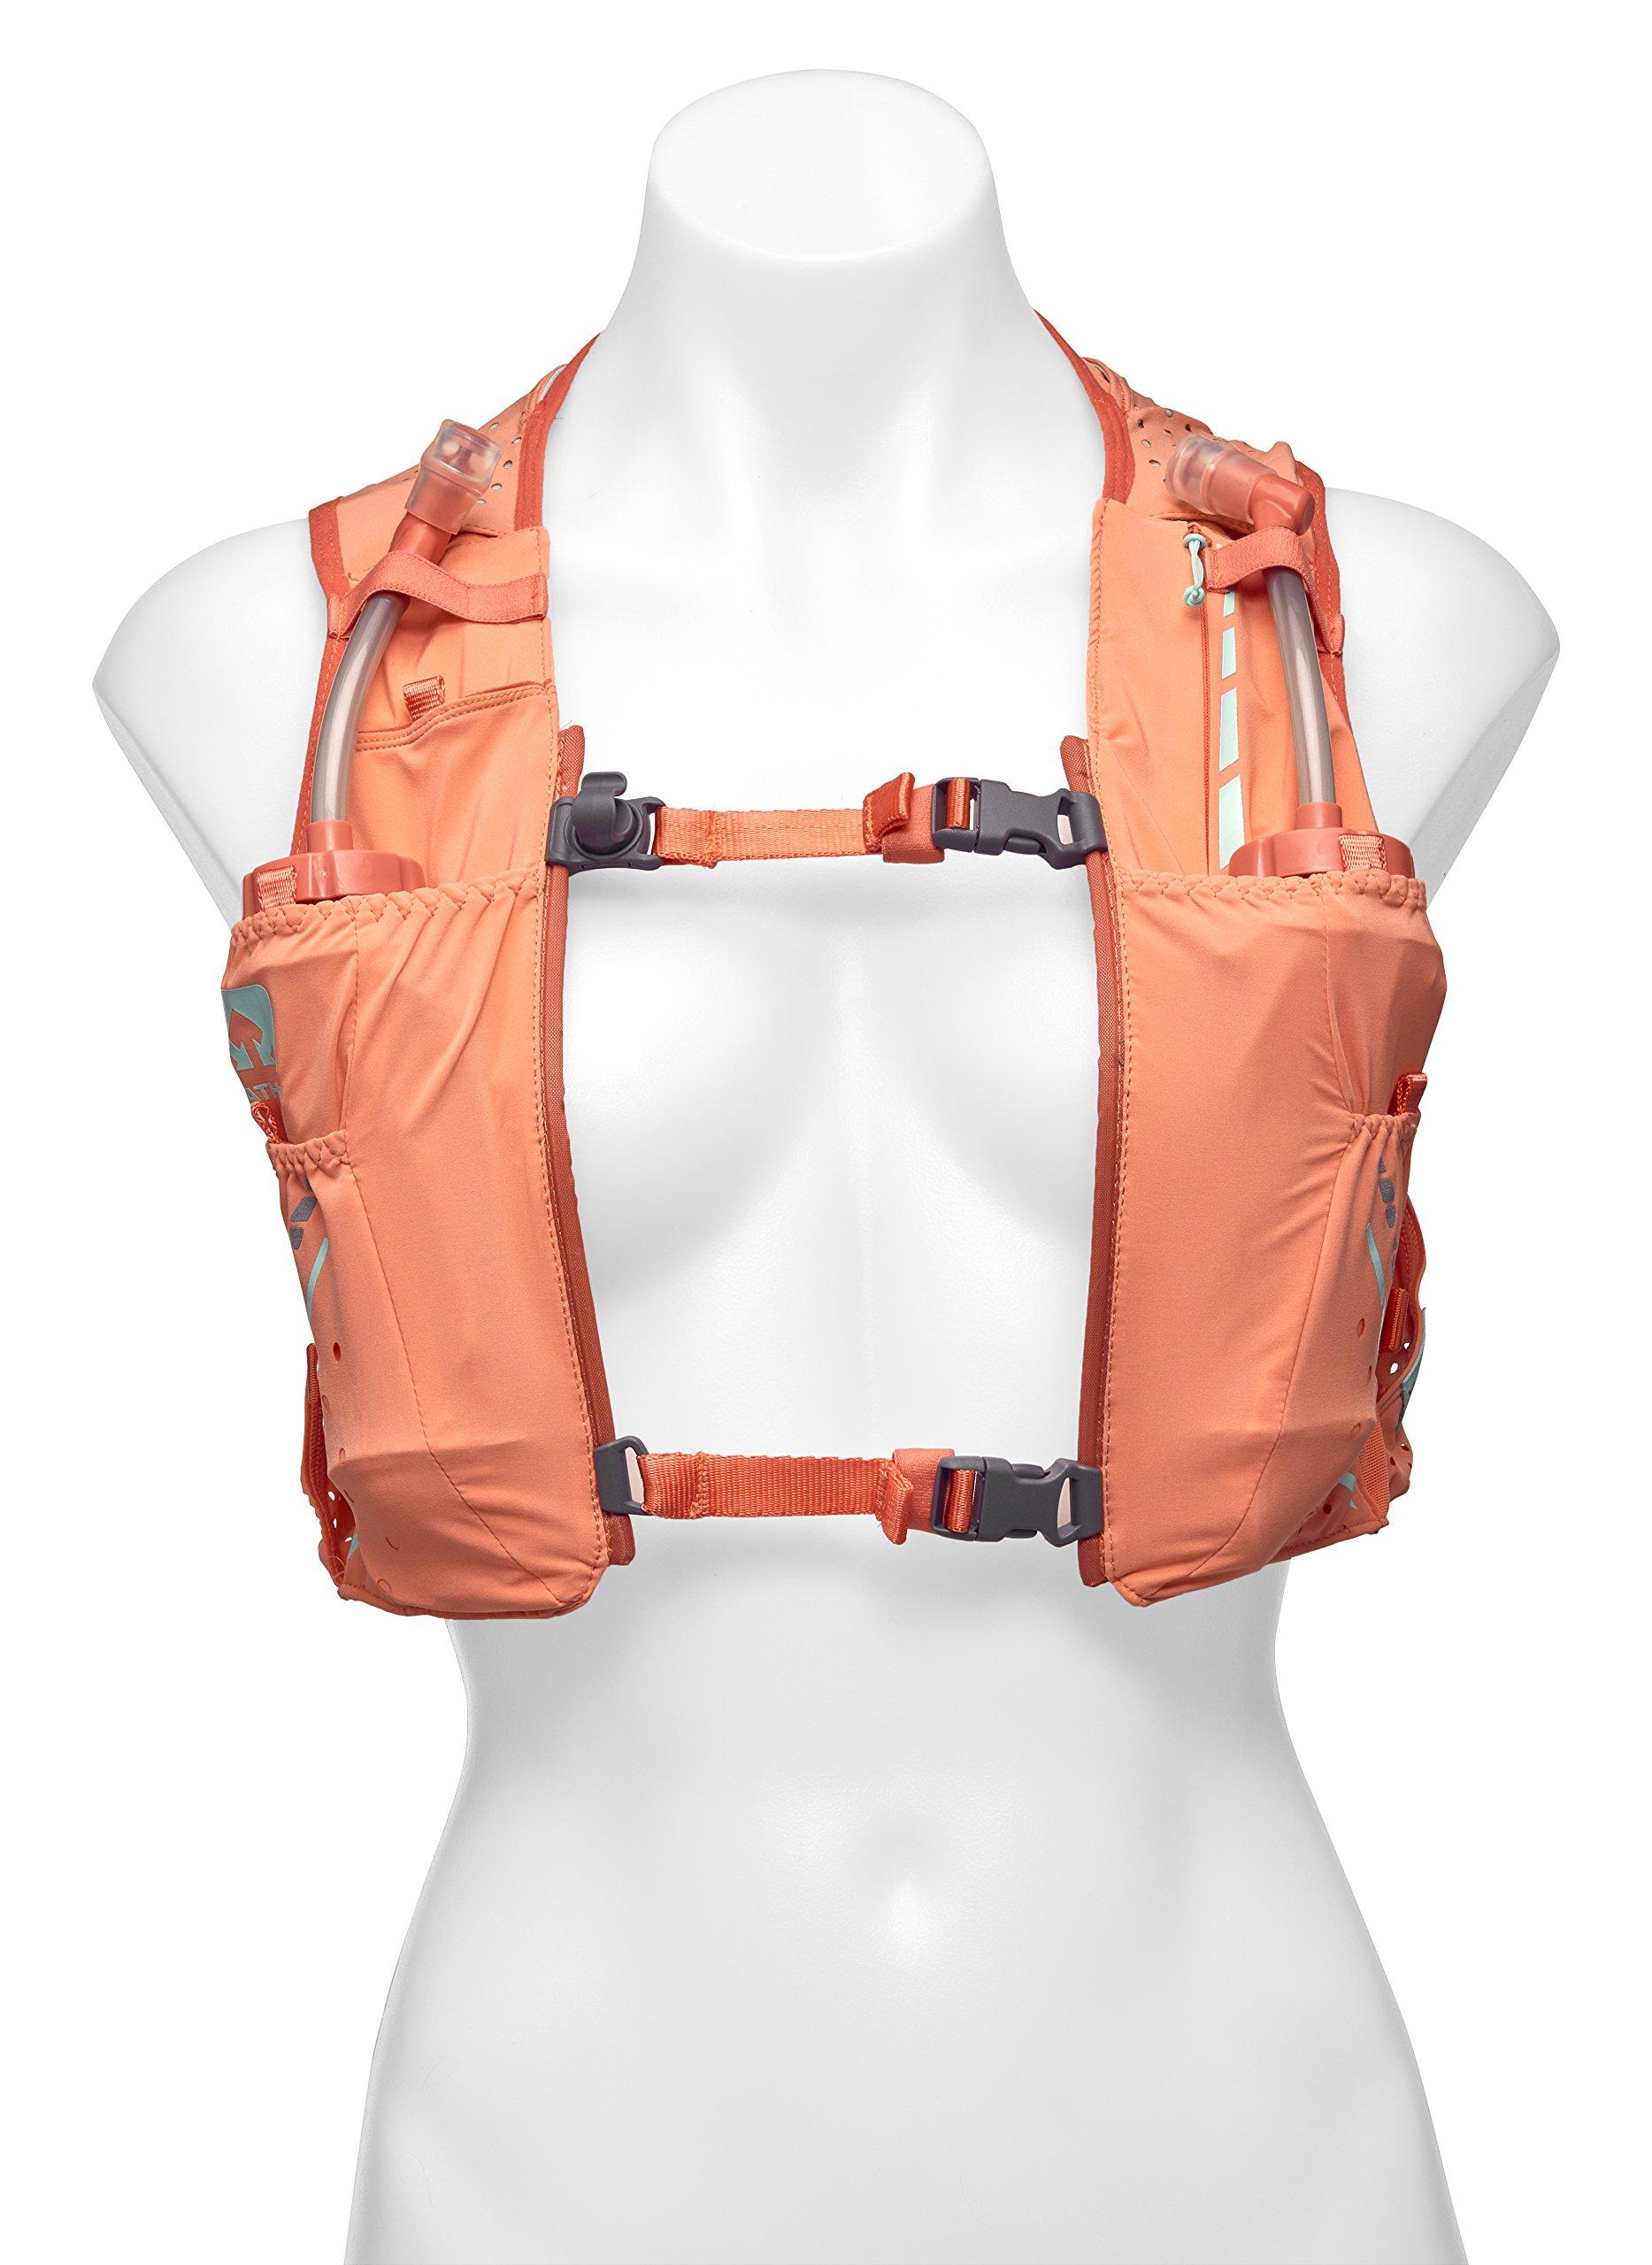 Nathan NS4537 Vaporhowe Hydaration Pack Running Vest with 1.5L Bladder, Fusion Coral, Medium